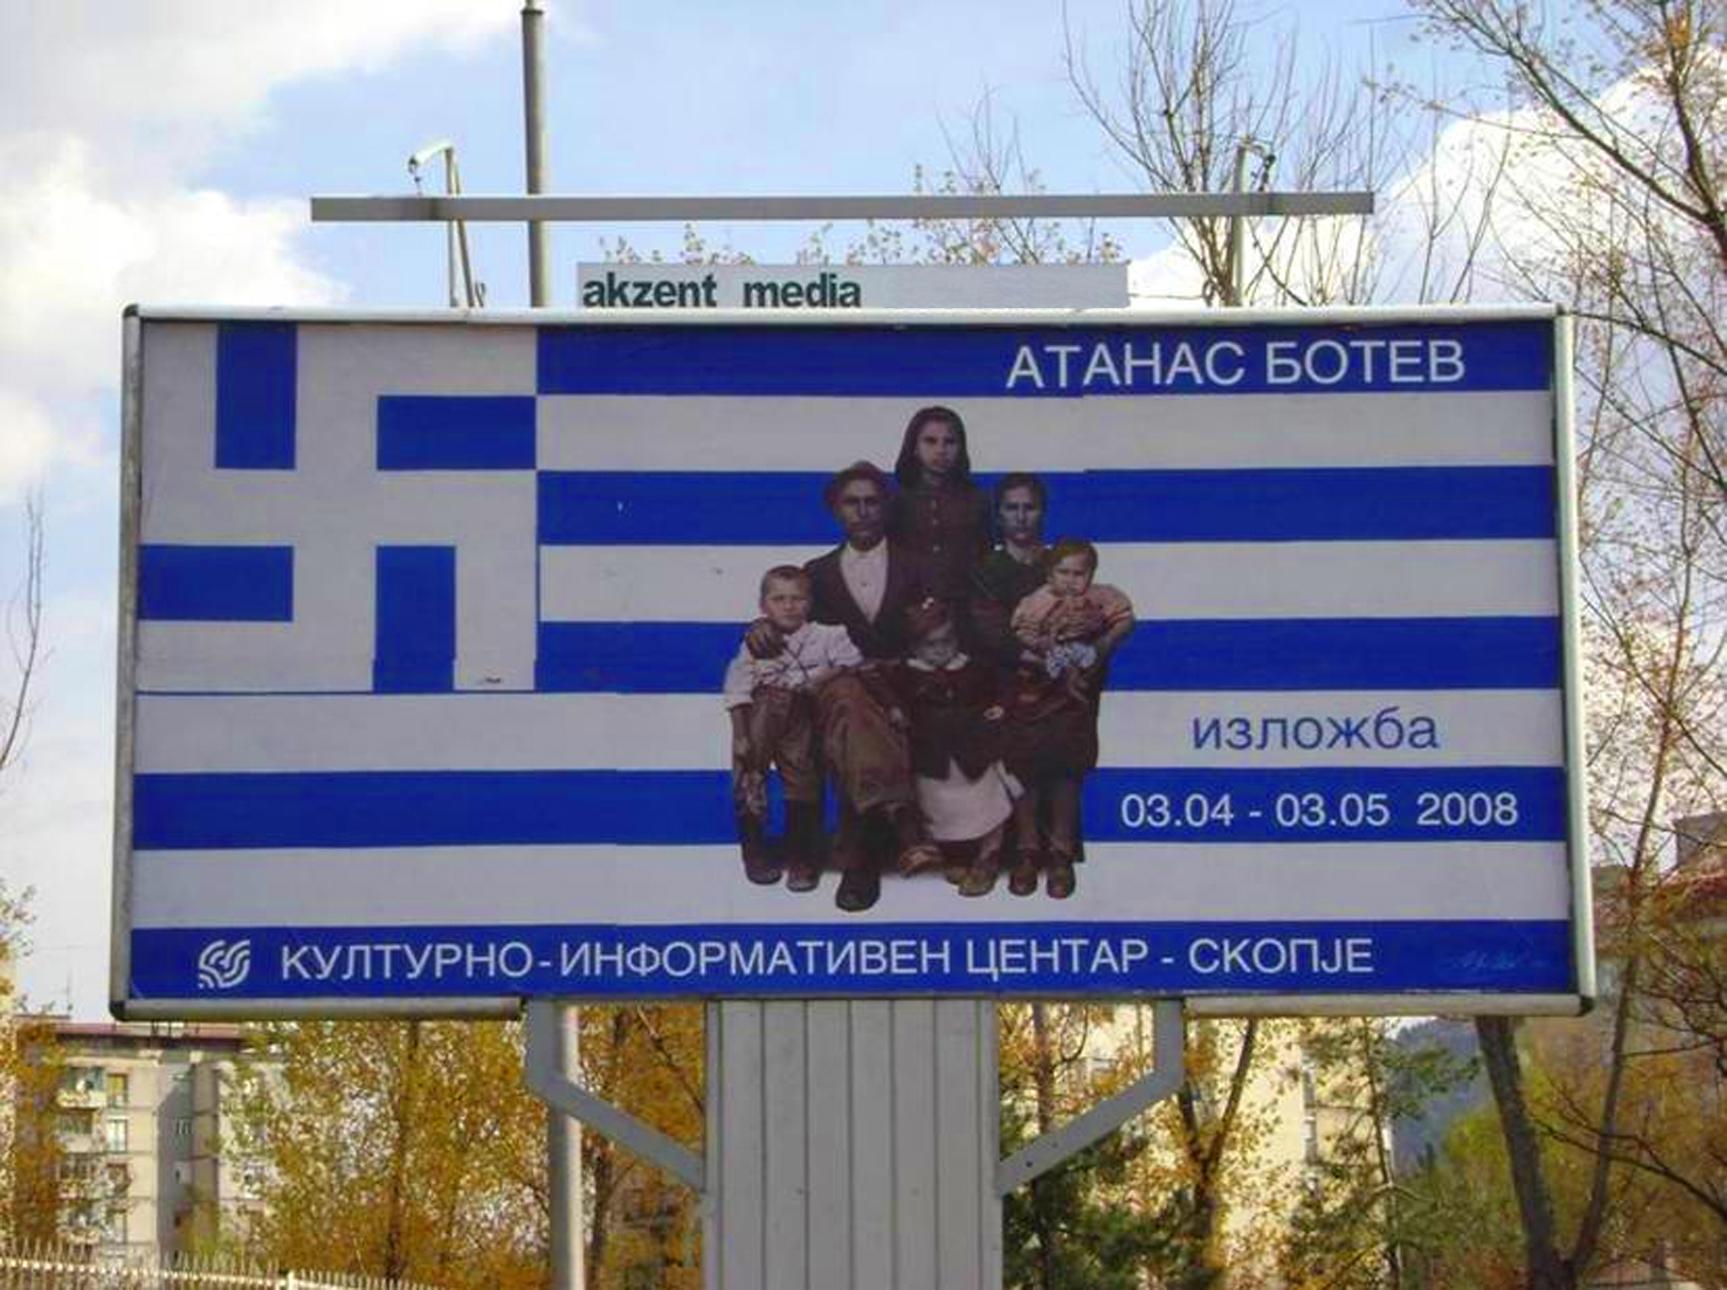 greece u0027fyrom izes u0027 macedonia u0027s car plates